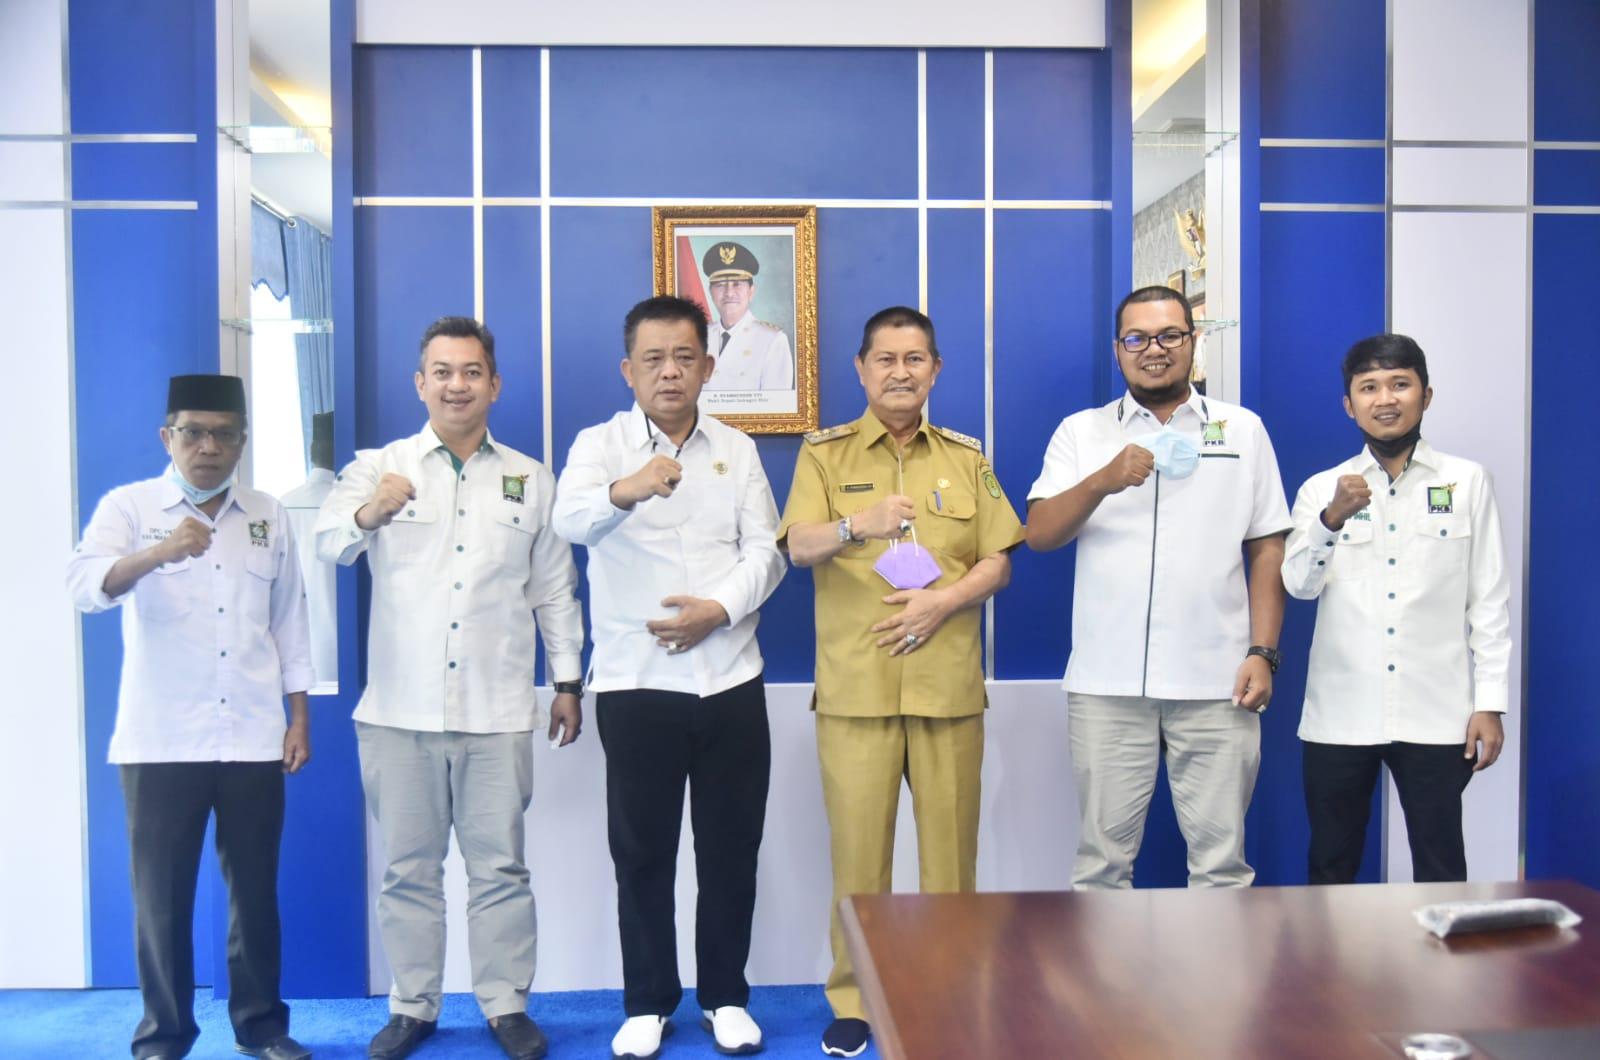 Jelang Muscab Ke-V, F-PKB DPRD Inhil Kunjungi Sejumlah Unsur Forkopimda dan Ketua PCNU Inhil